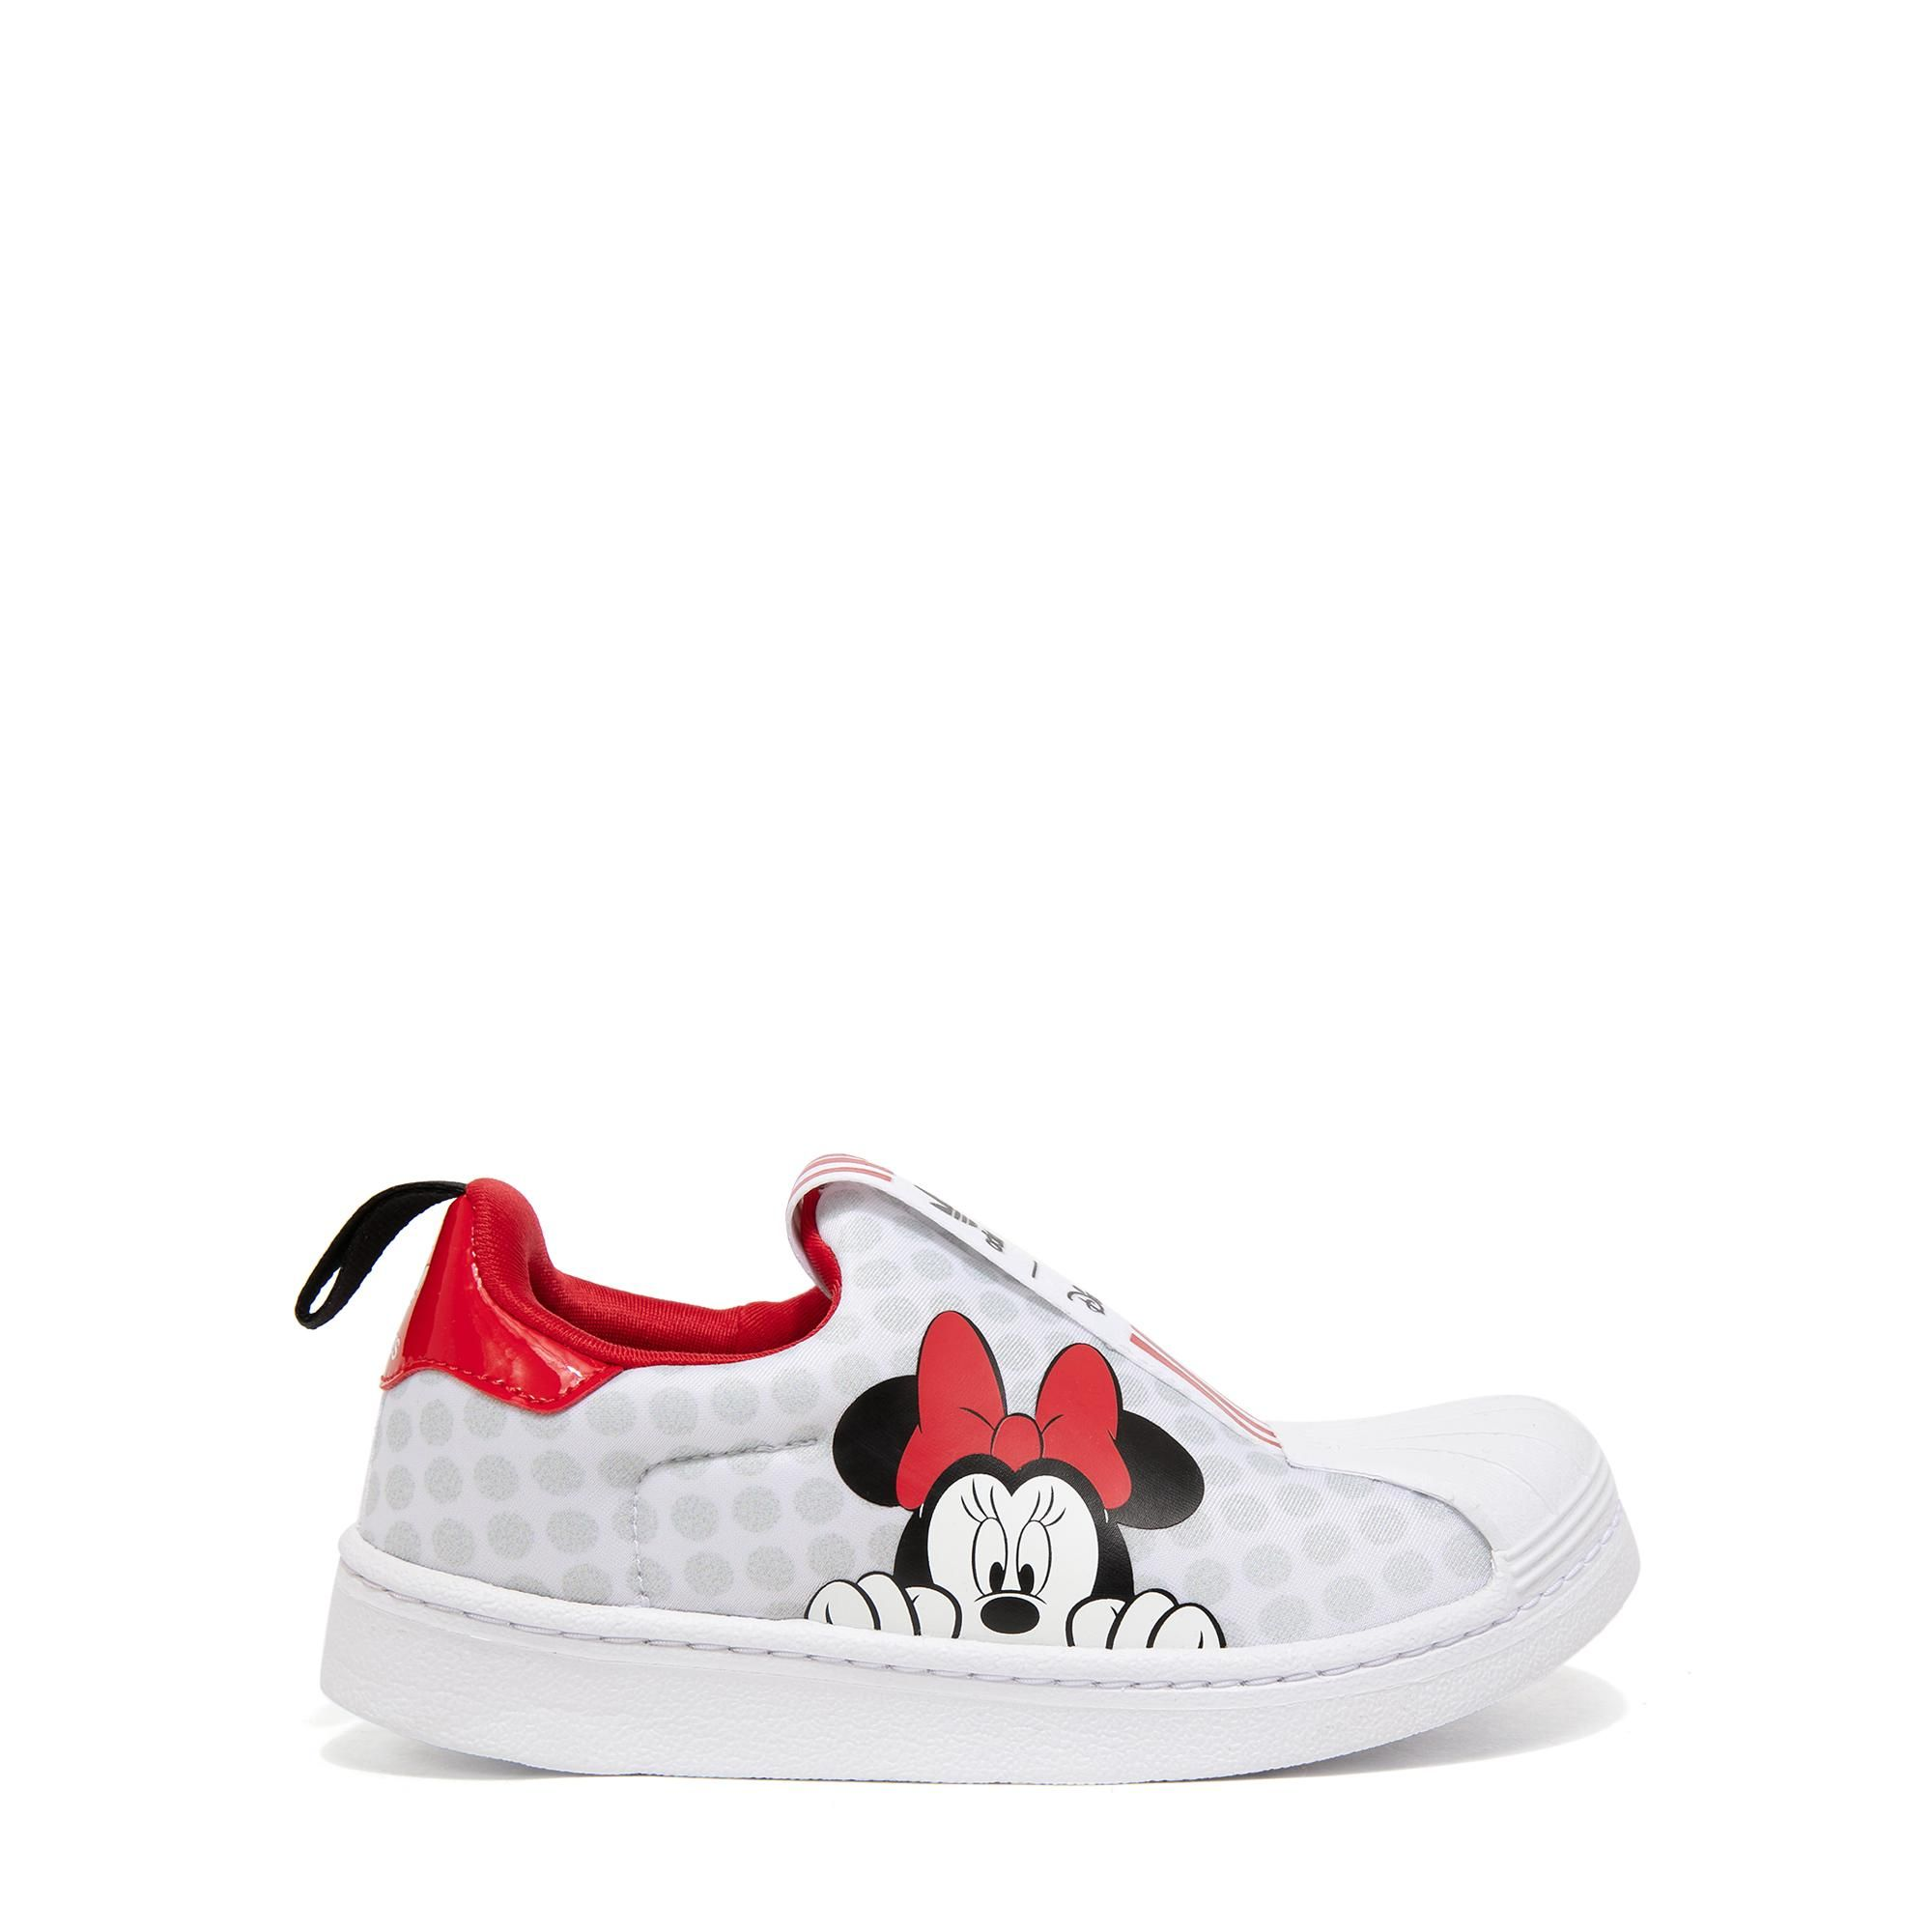 Superstar 360 Minnie sneakers